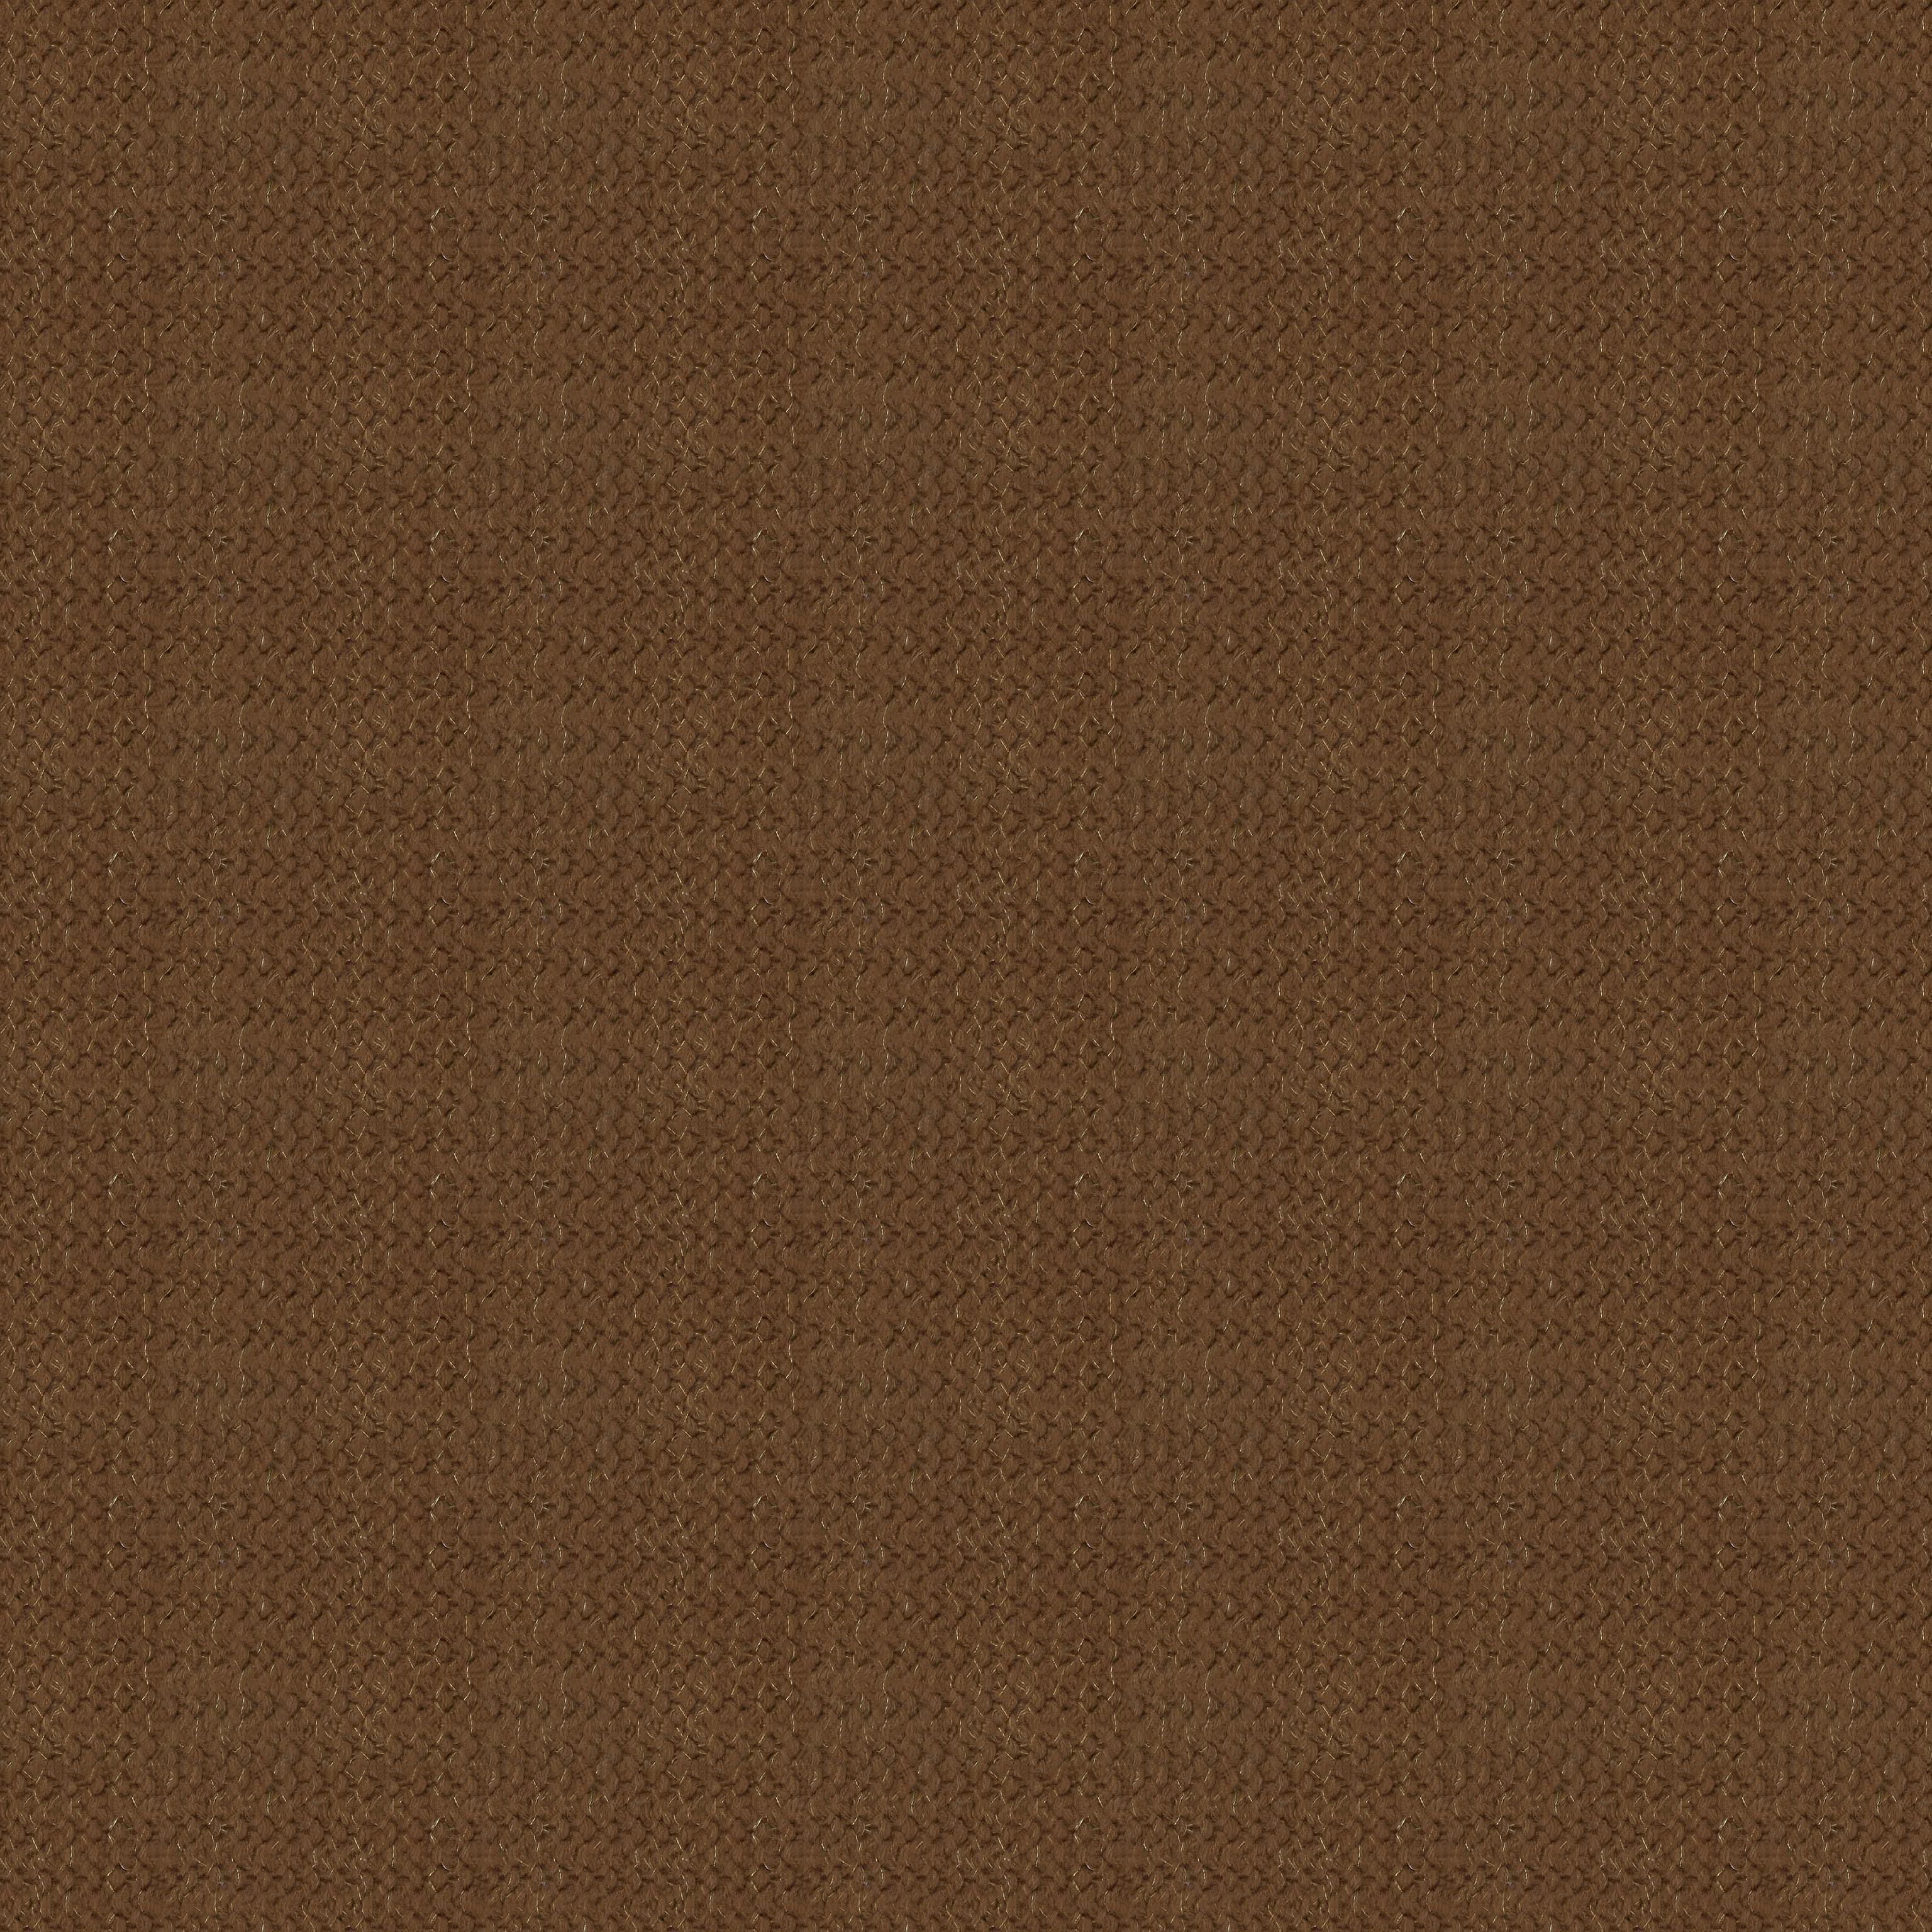 Wood Texture Floor Pattern Brown Circle Knitwear Textile Hardwood Flooring Sparkles Laminate